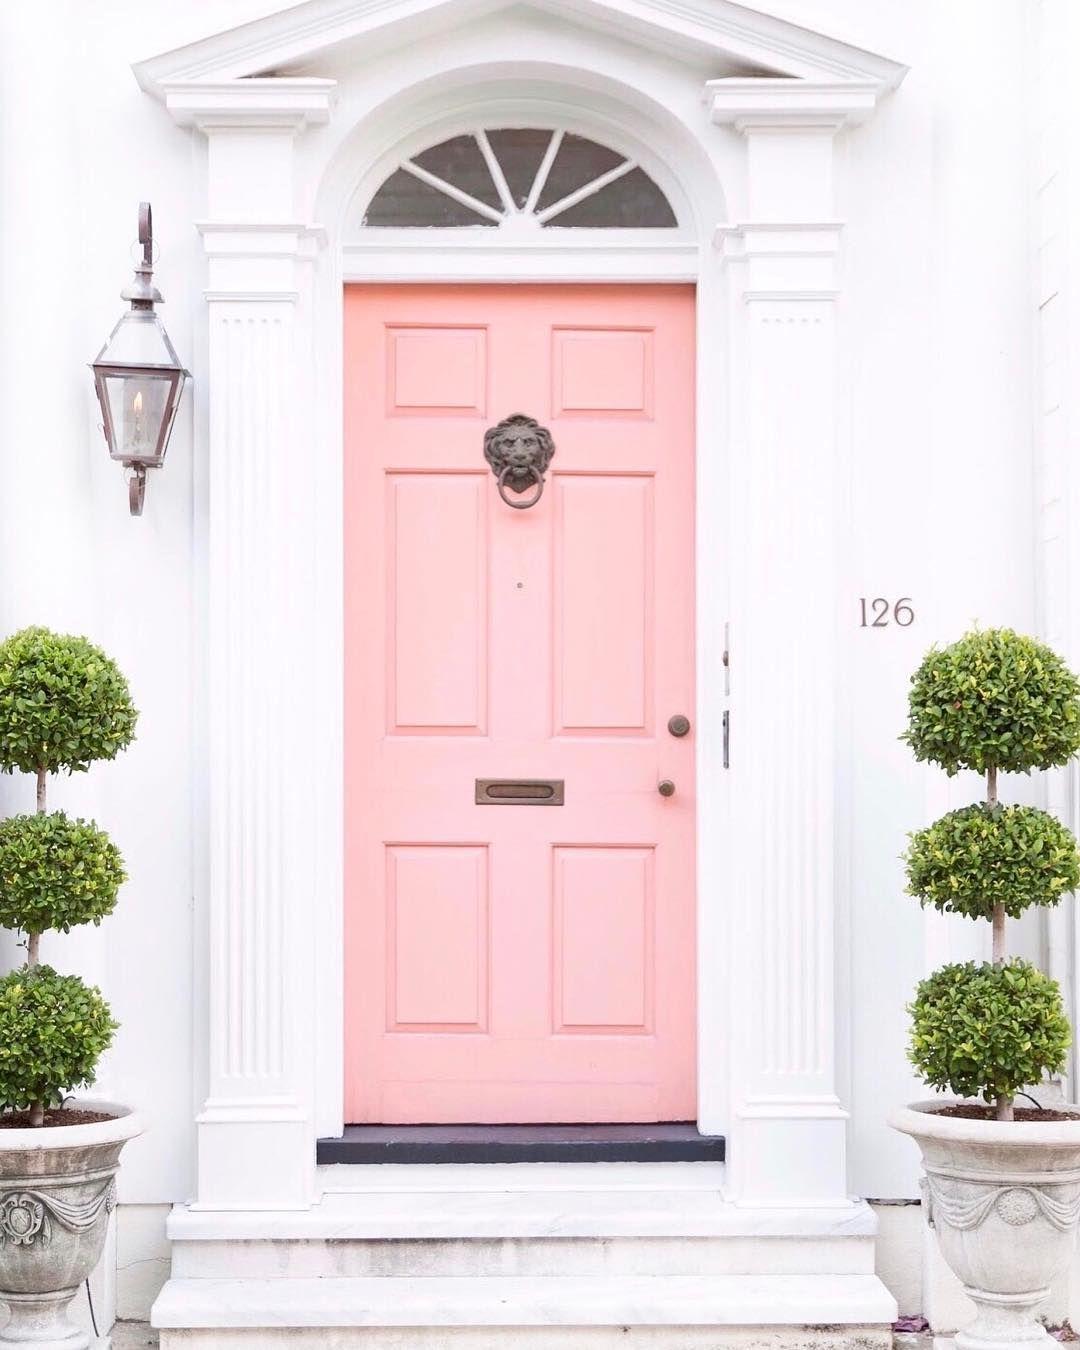 Instagram | Houses | Pinterest | Instagram and House